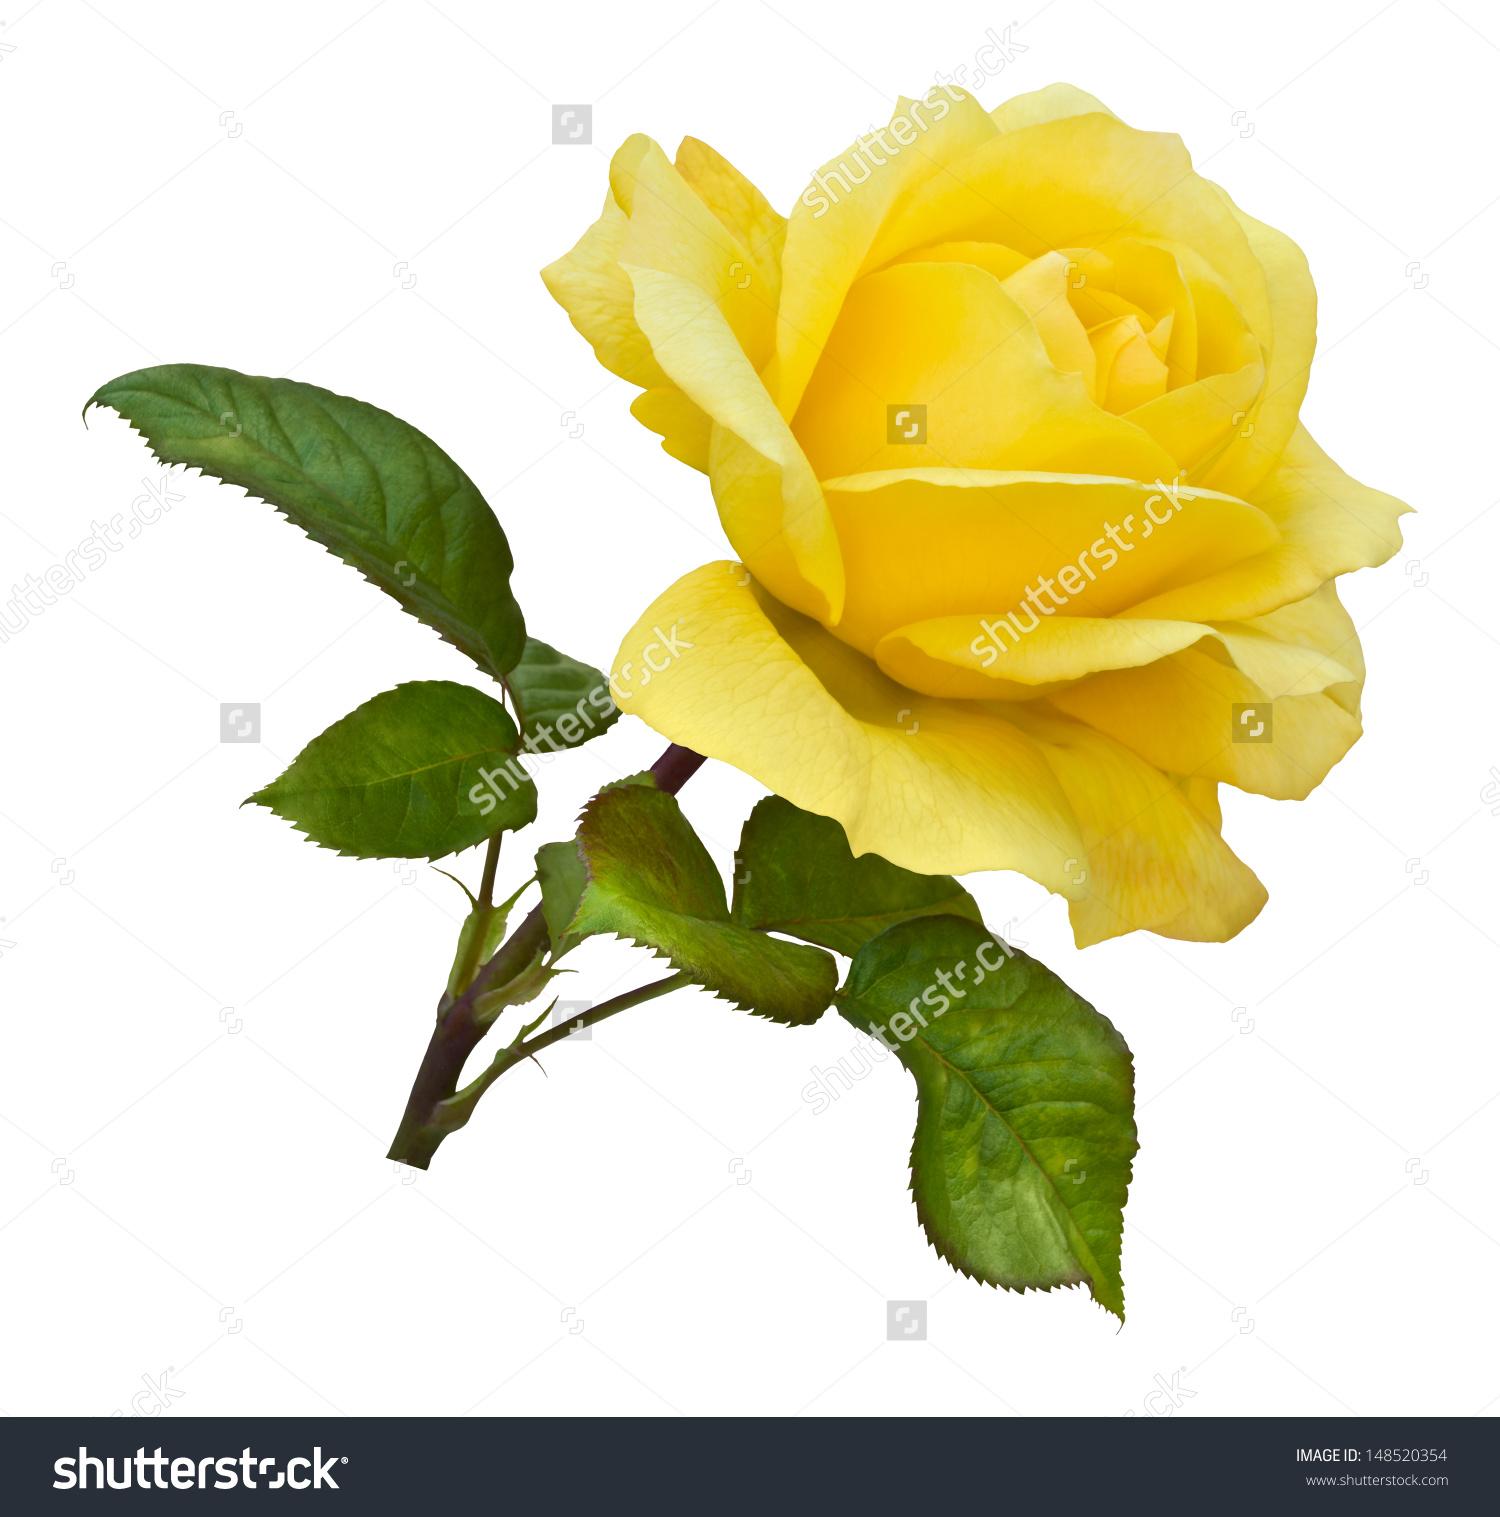 Yellow Rose clipart long stem #13